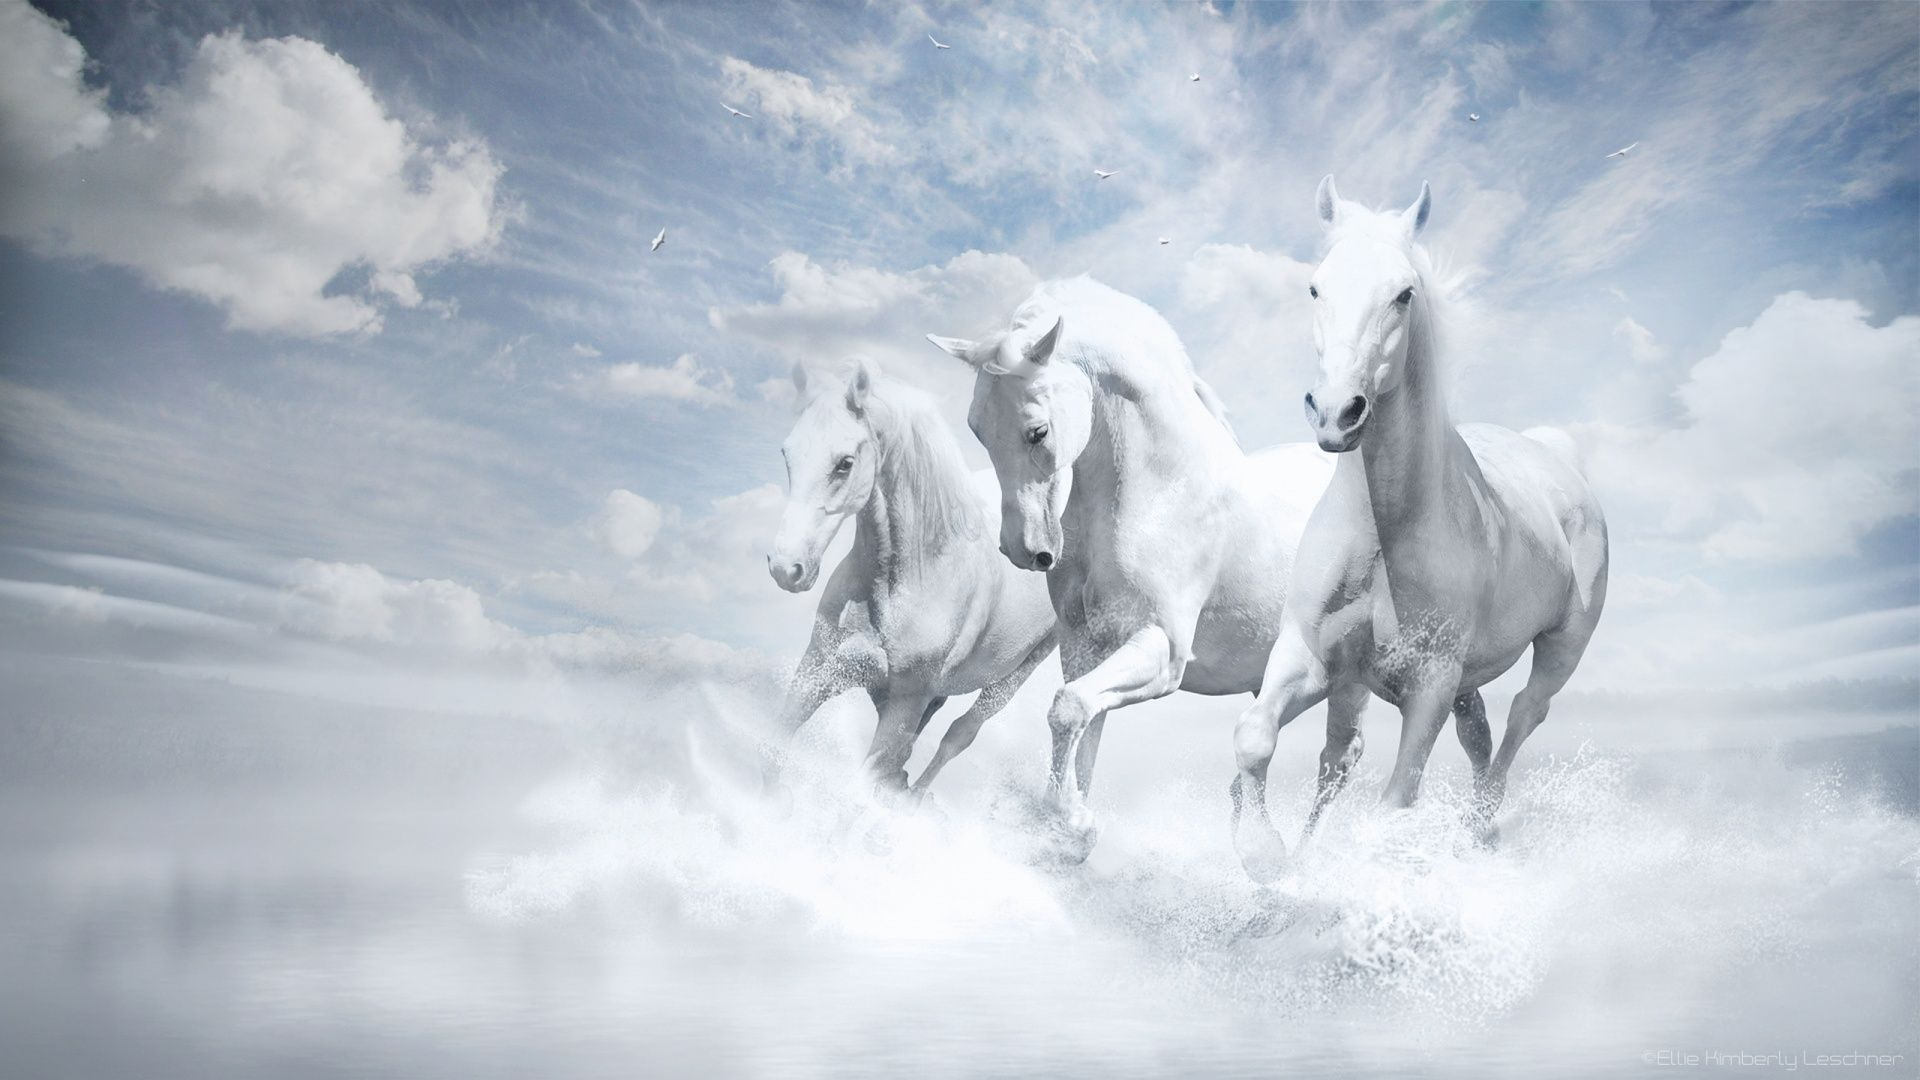 White Horses Hd Wallpaper At Wallpapersmap Com Horse Wallpaper White Horses Horses